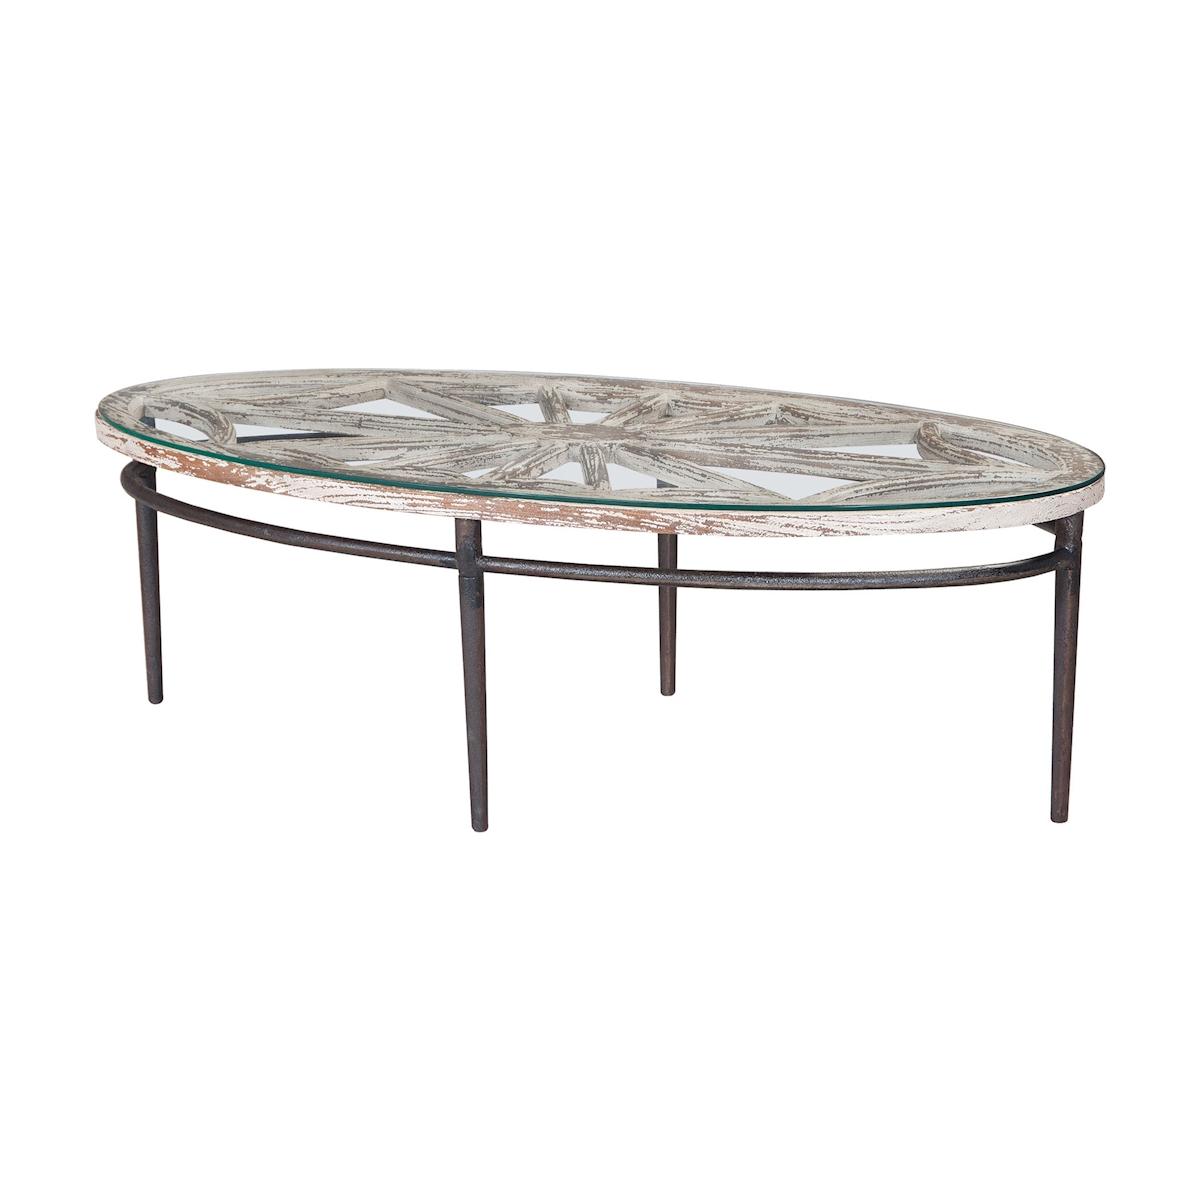 Farmhouse Oval Coffee Table | Elk Home